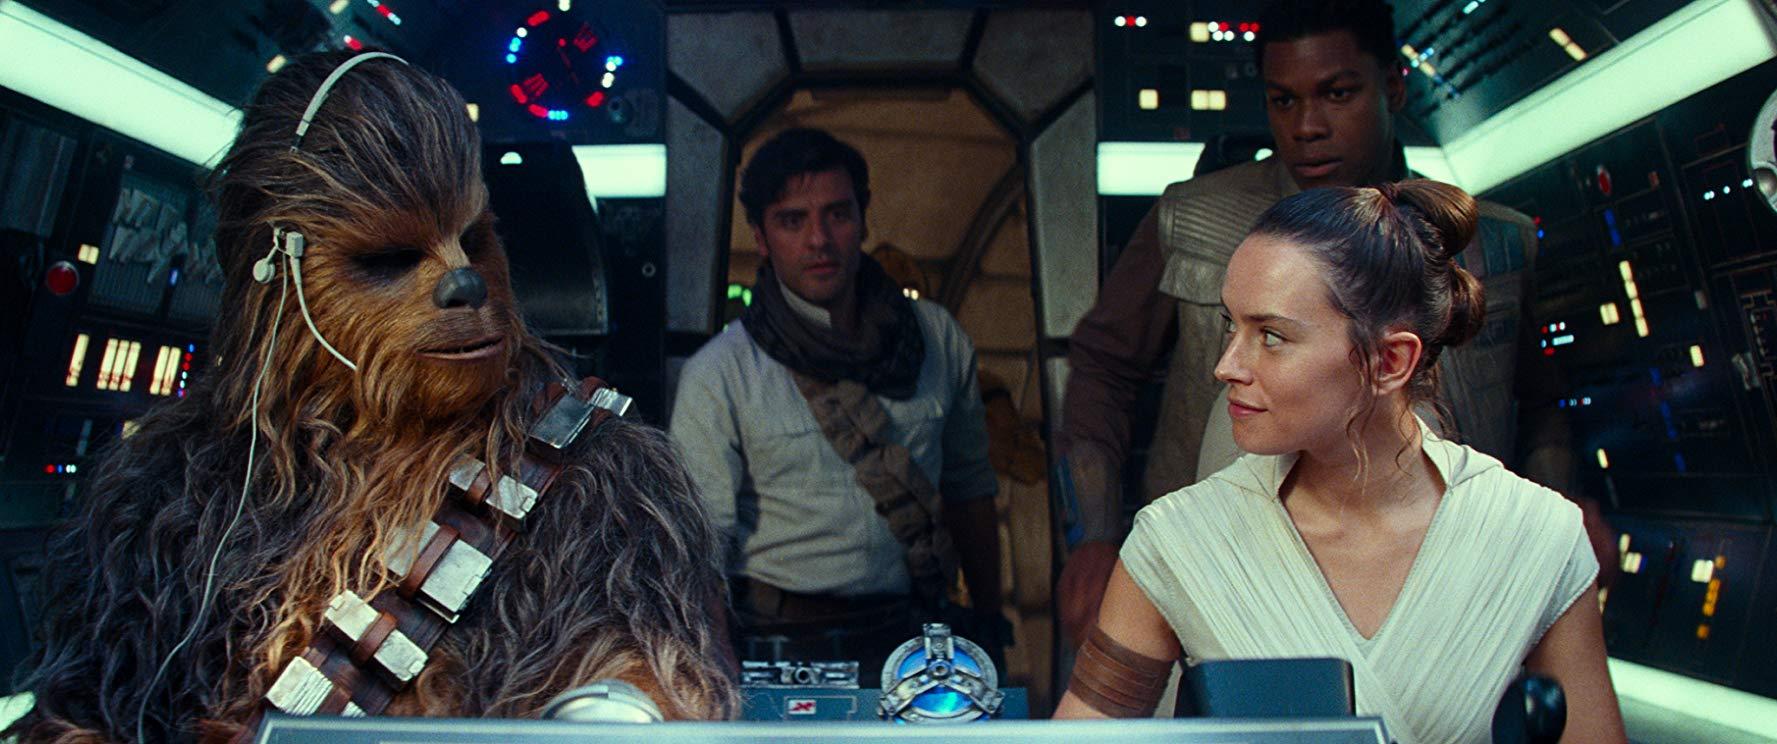 Crítica: Star Wars – A Ascensão Skywalker